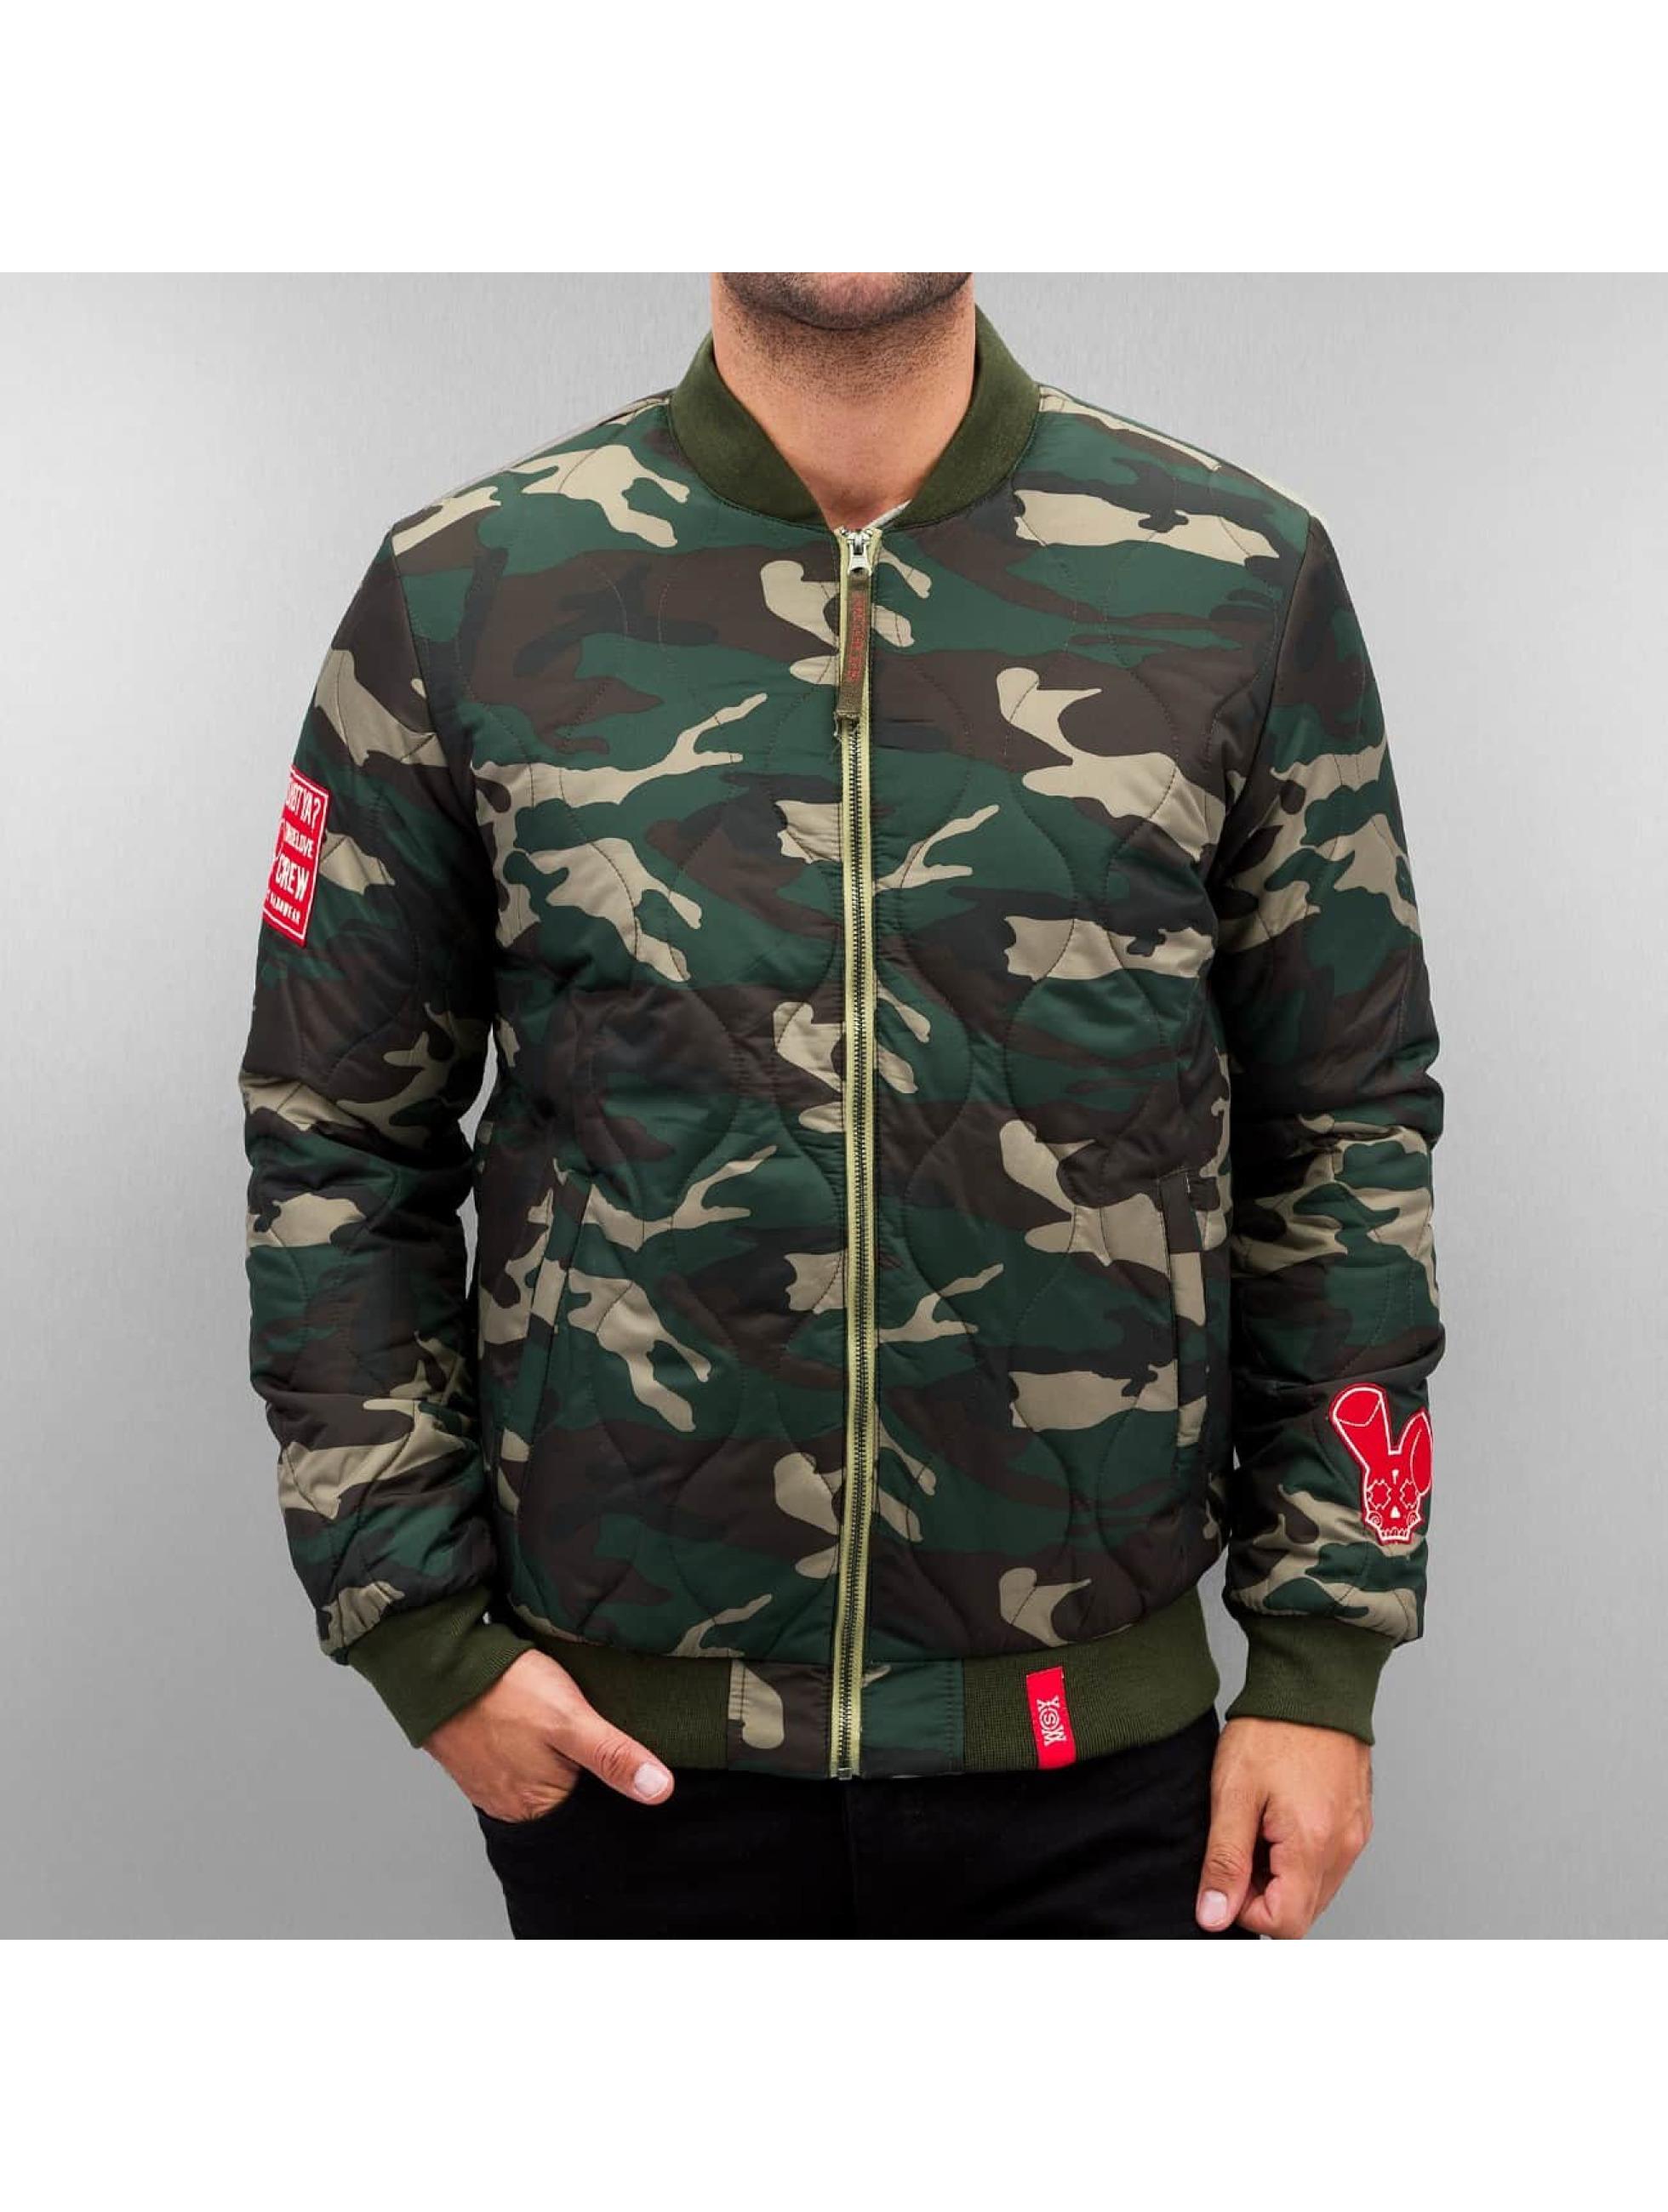 Who Shot Ya? Lightweight Jacket Camo camouflage